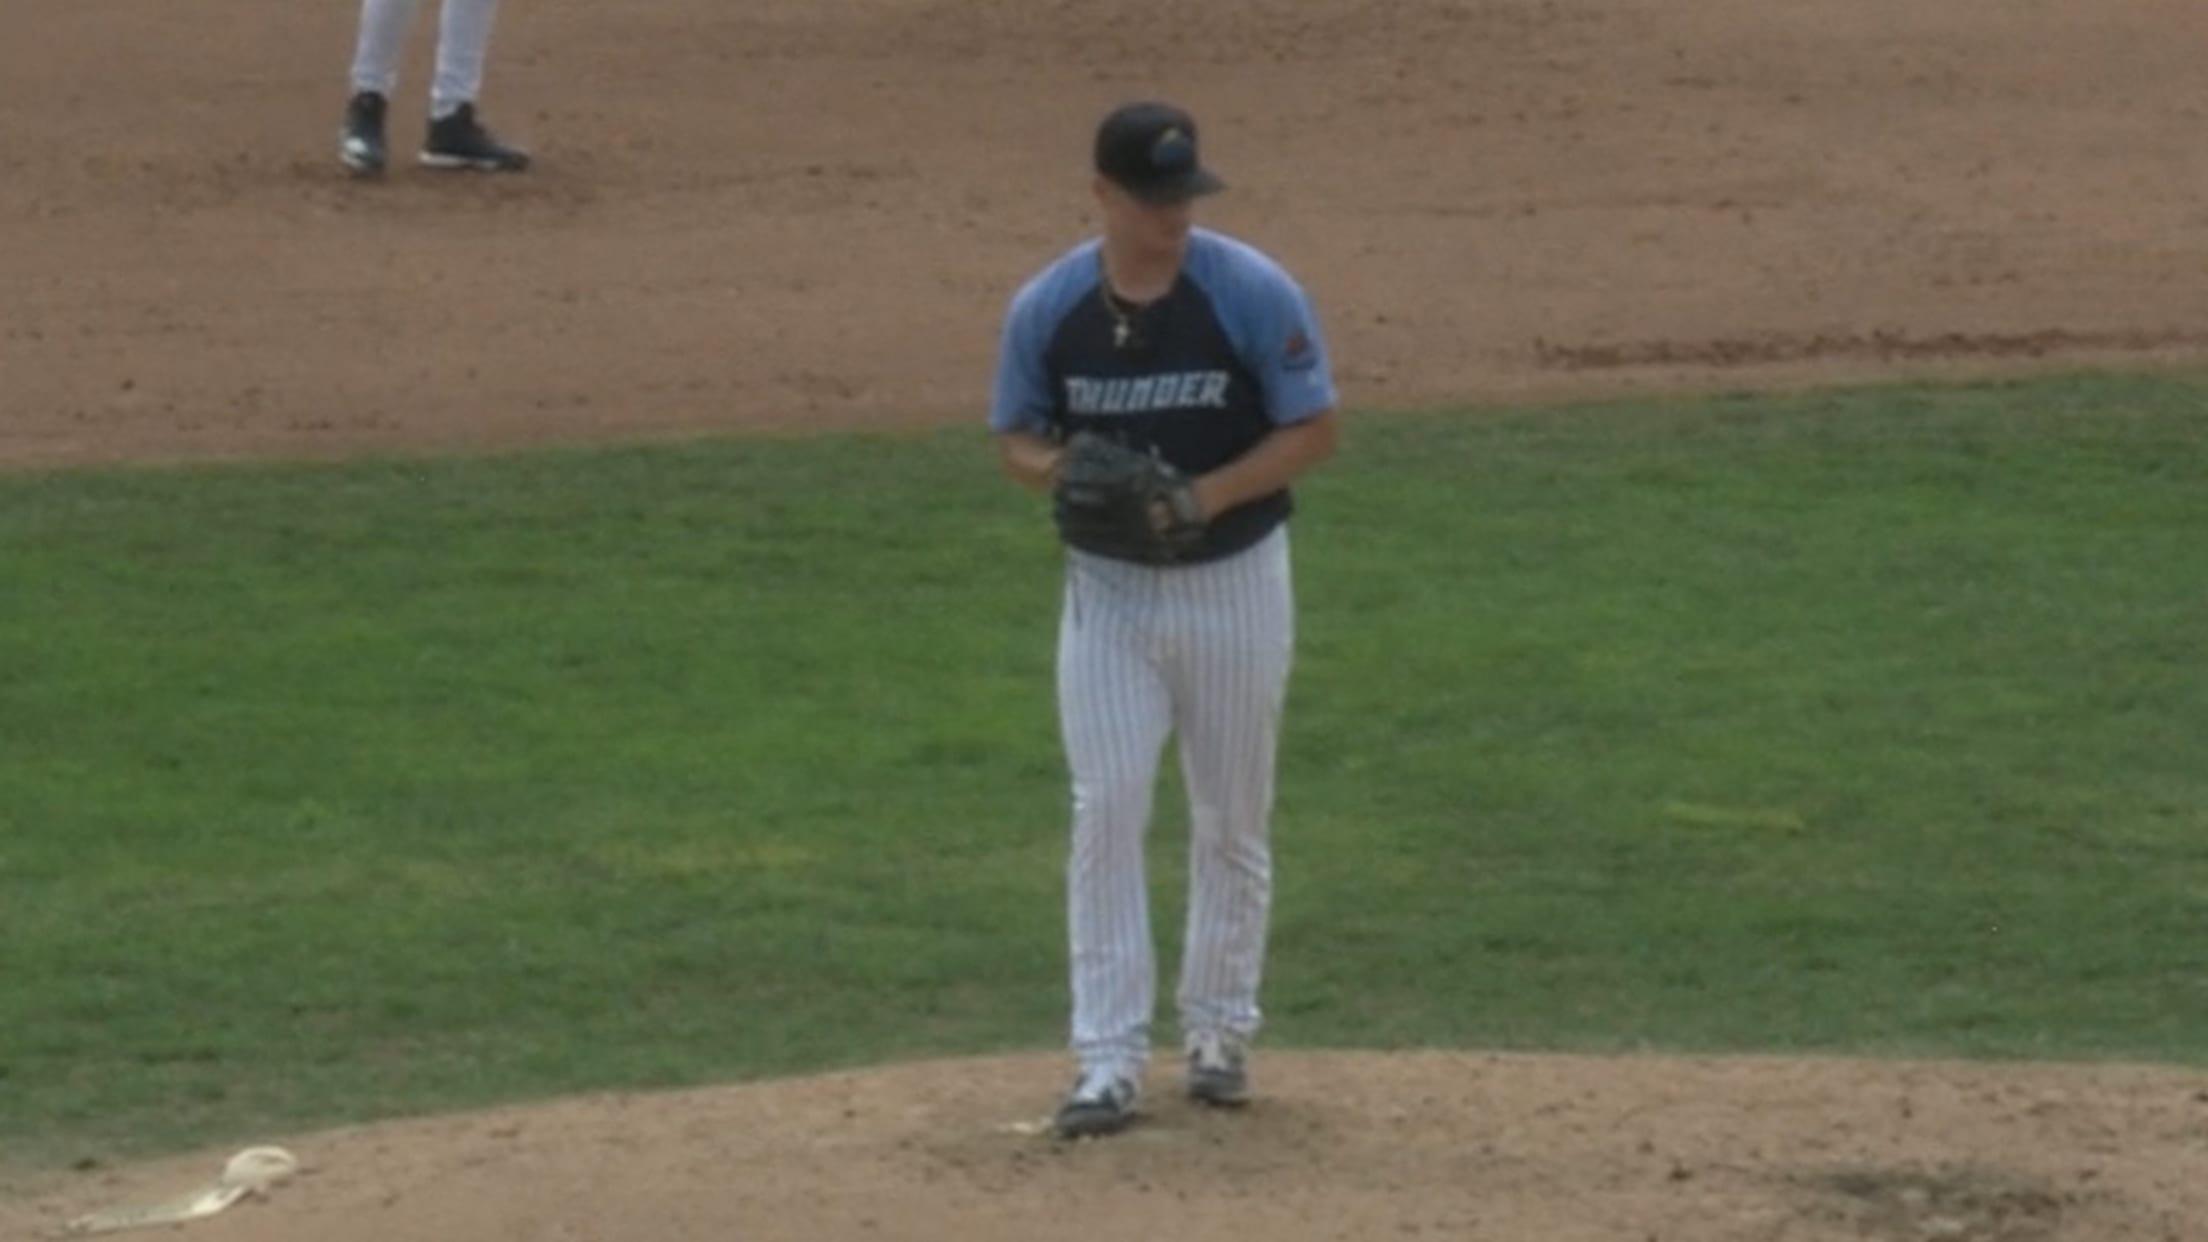 Top Prospects: Schmidt, NYY